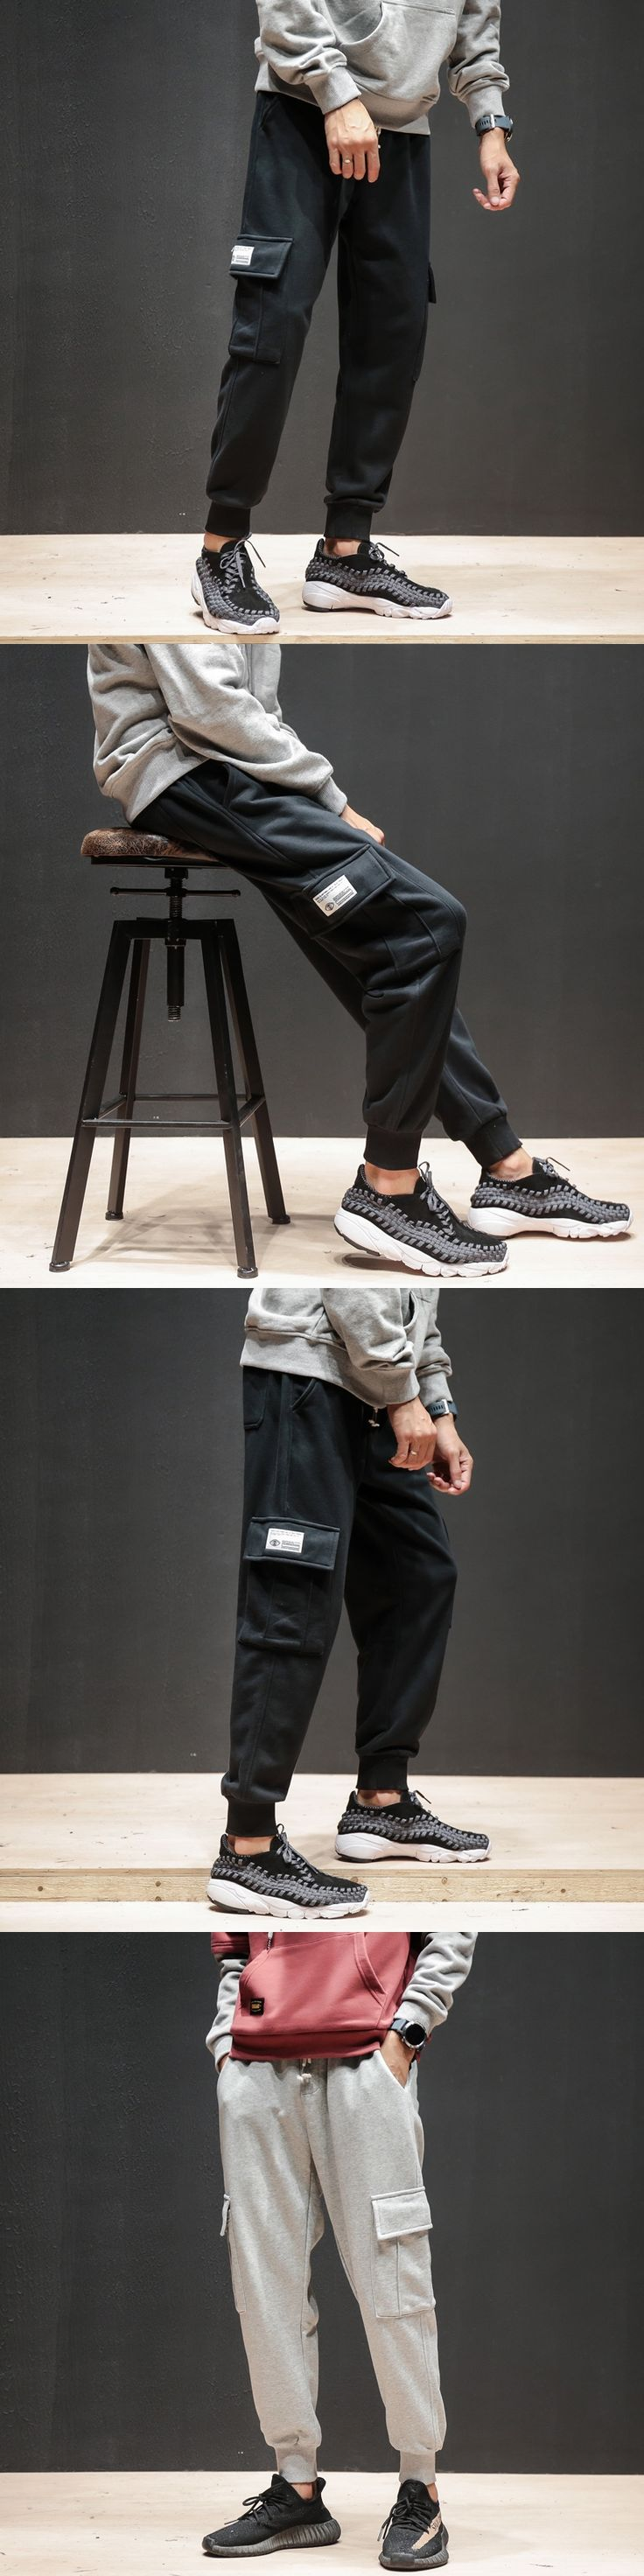 Men Street Fashion Casual Cargo Pants Jogger Sweatpants Male High Quality Loose Cotton Harem Trousers